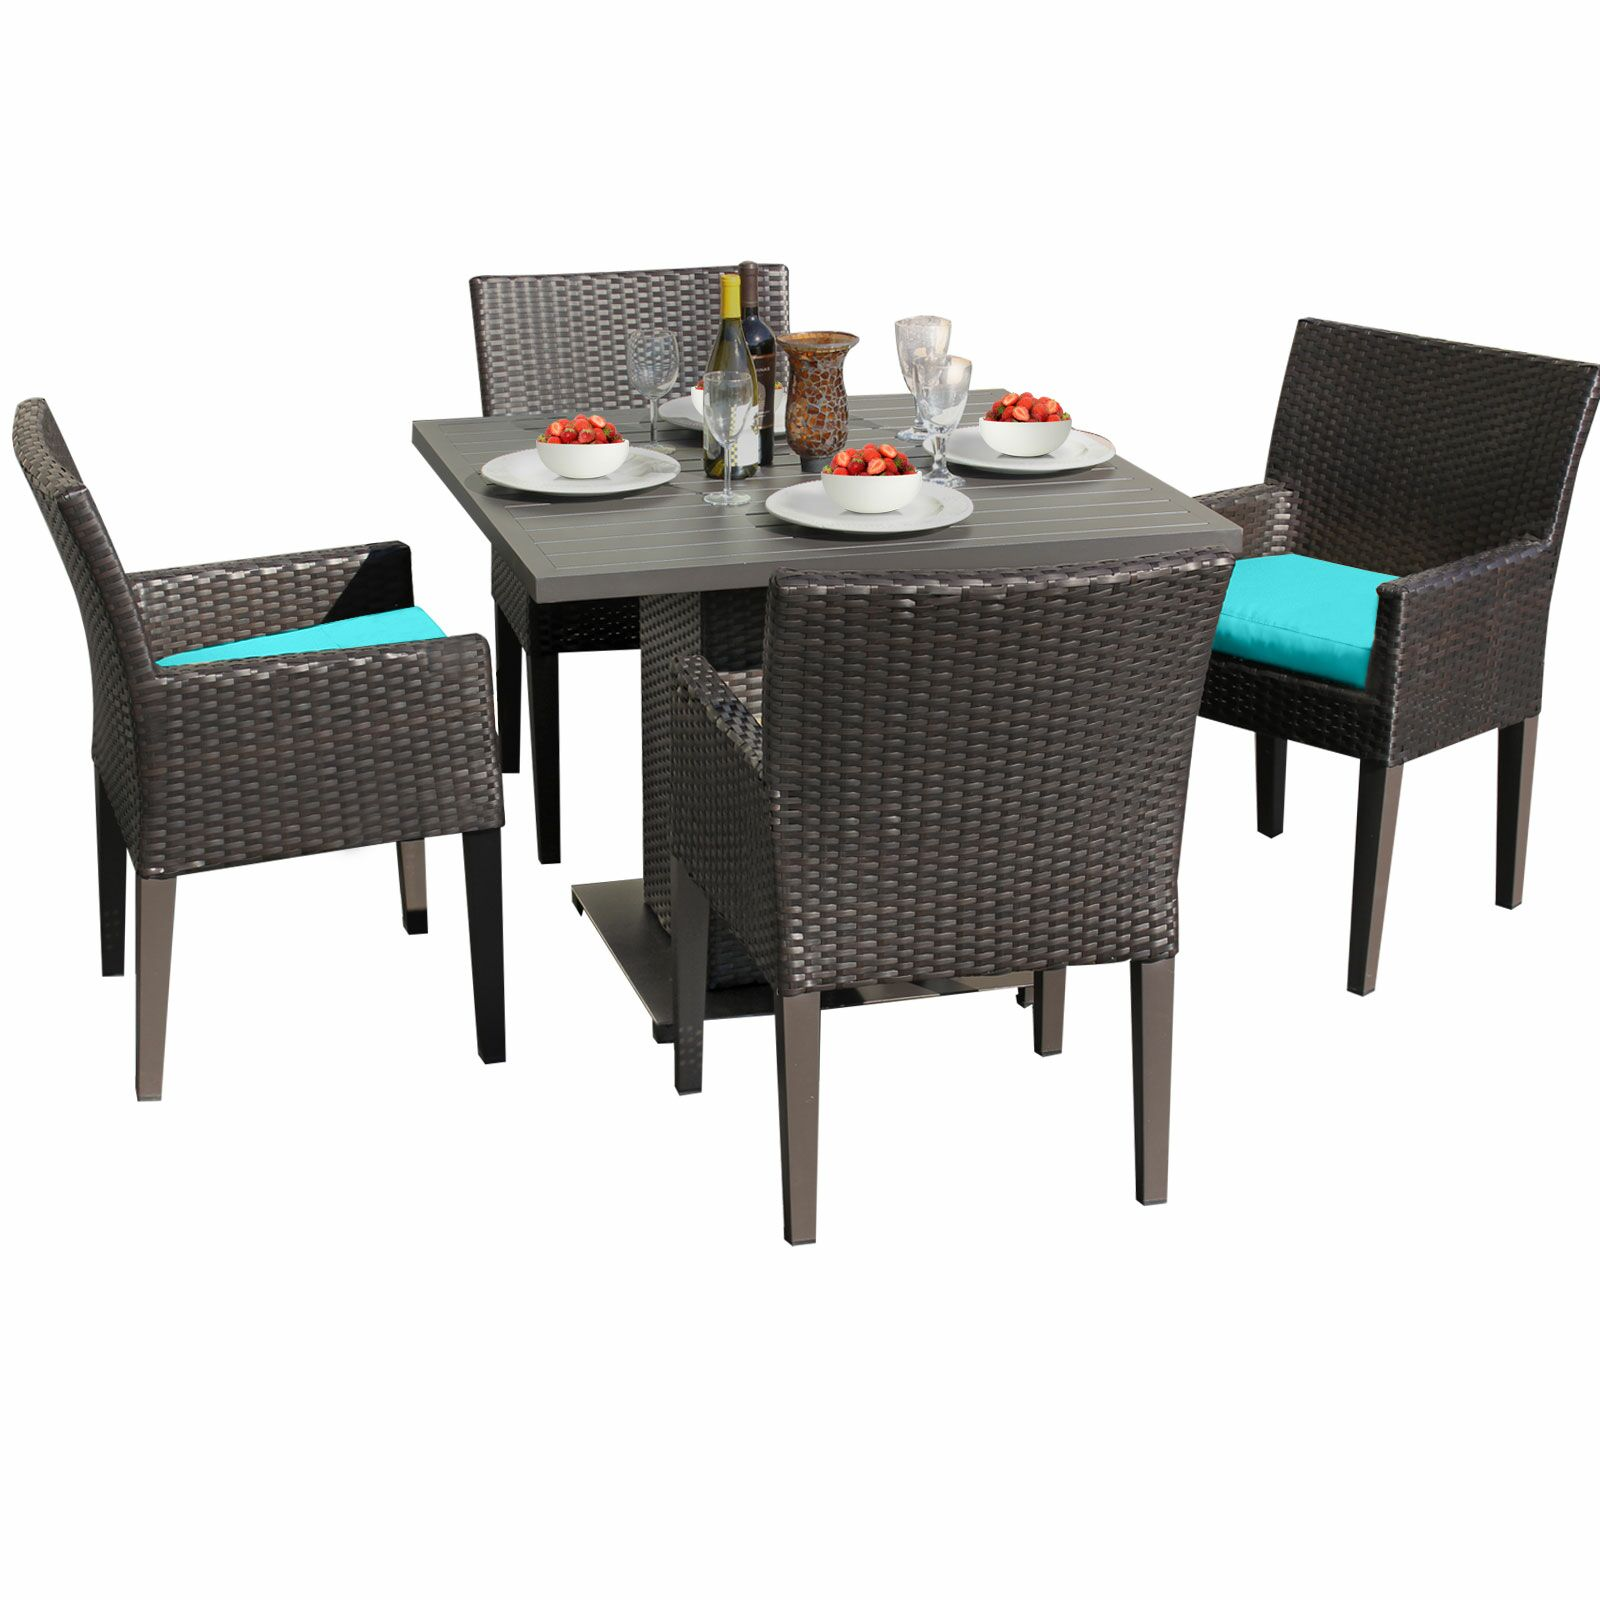 Napa 5 Piece Dining Set with Cushions Color: Aruba